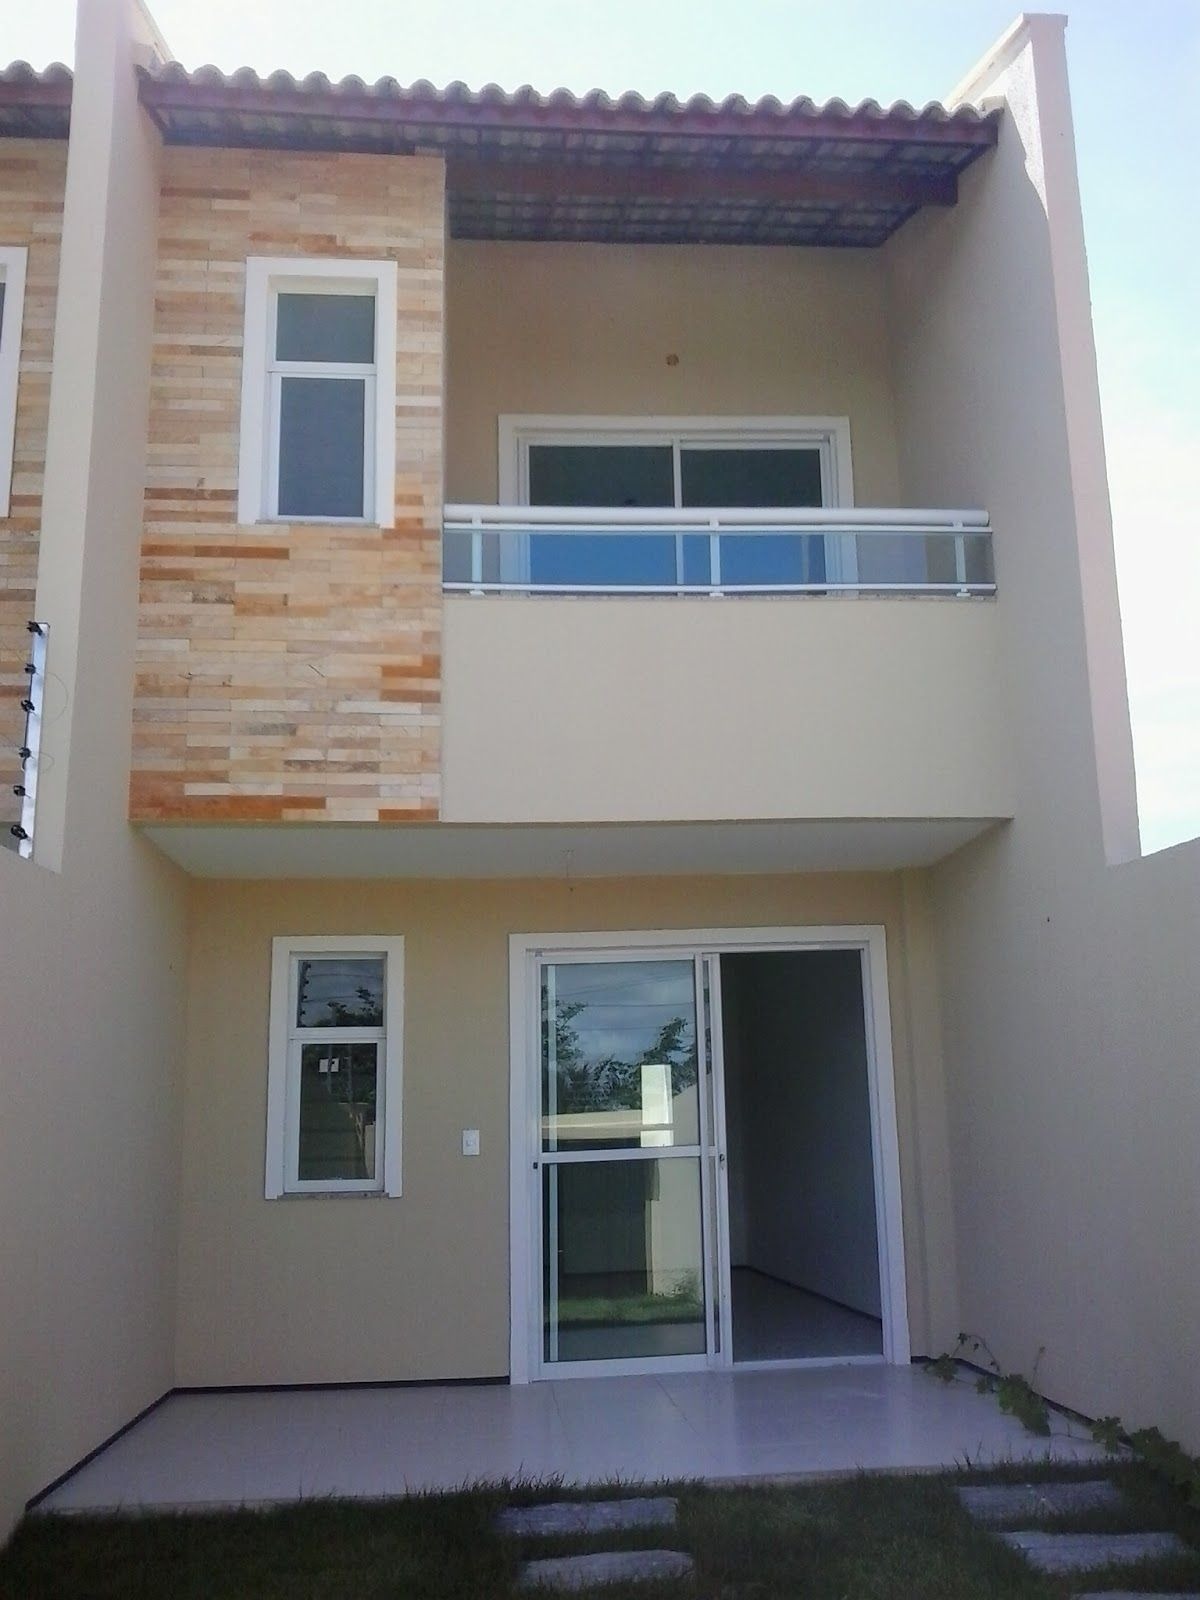 Resultado de imagem para fachadas de casas duplex pequenas for Modelo de casa pequena para construir